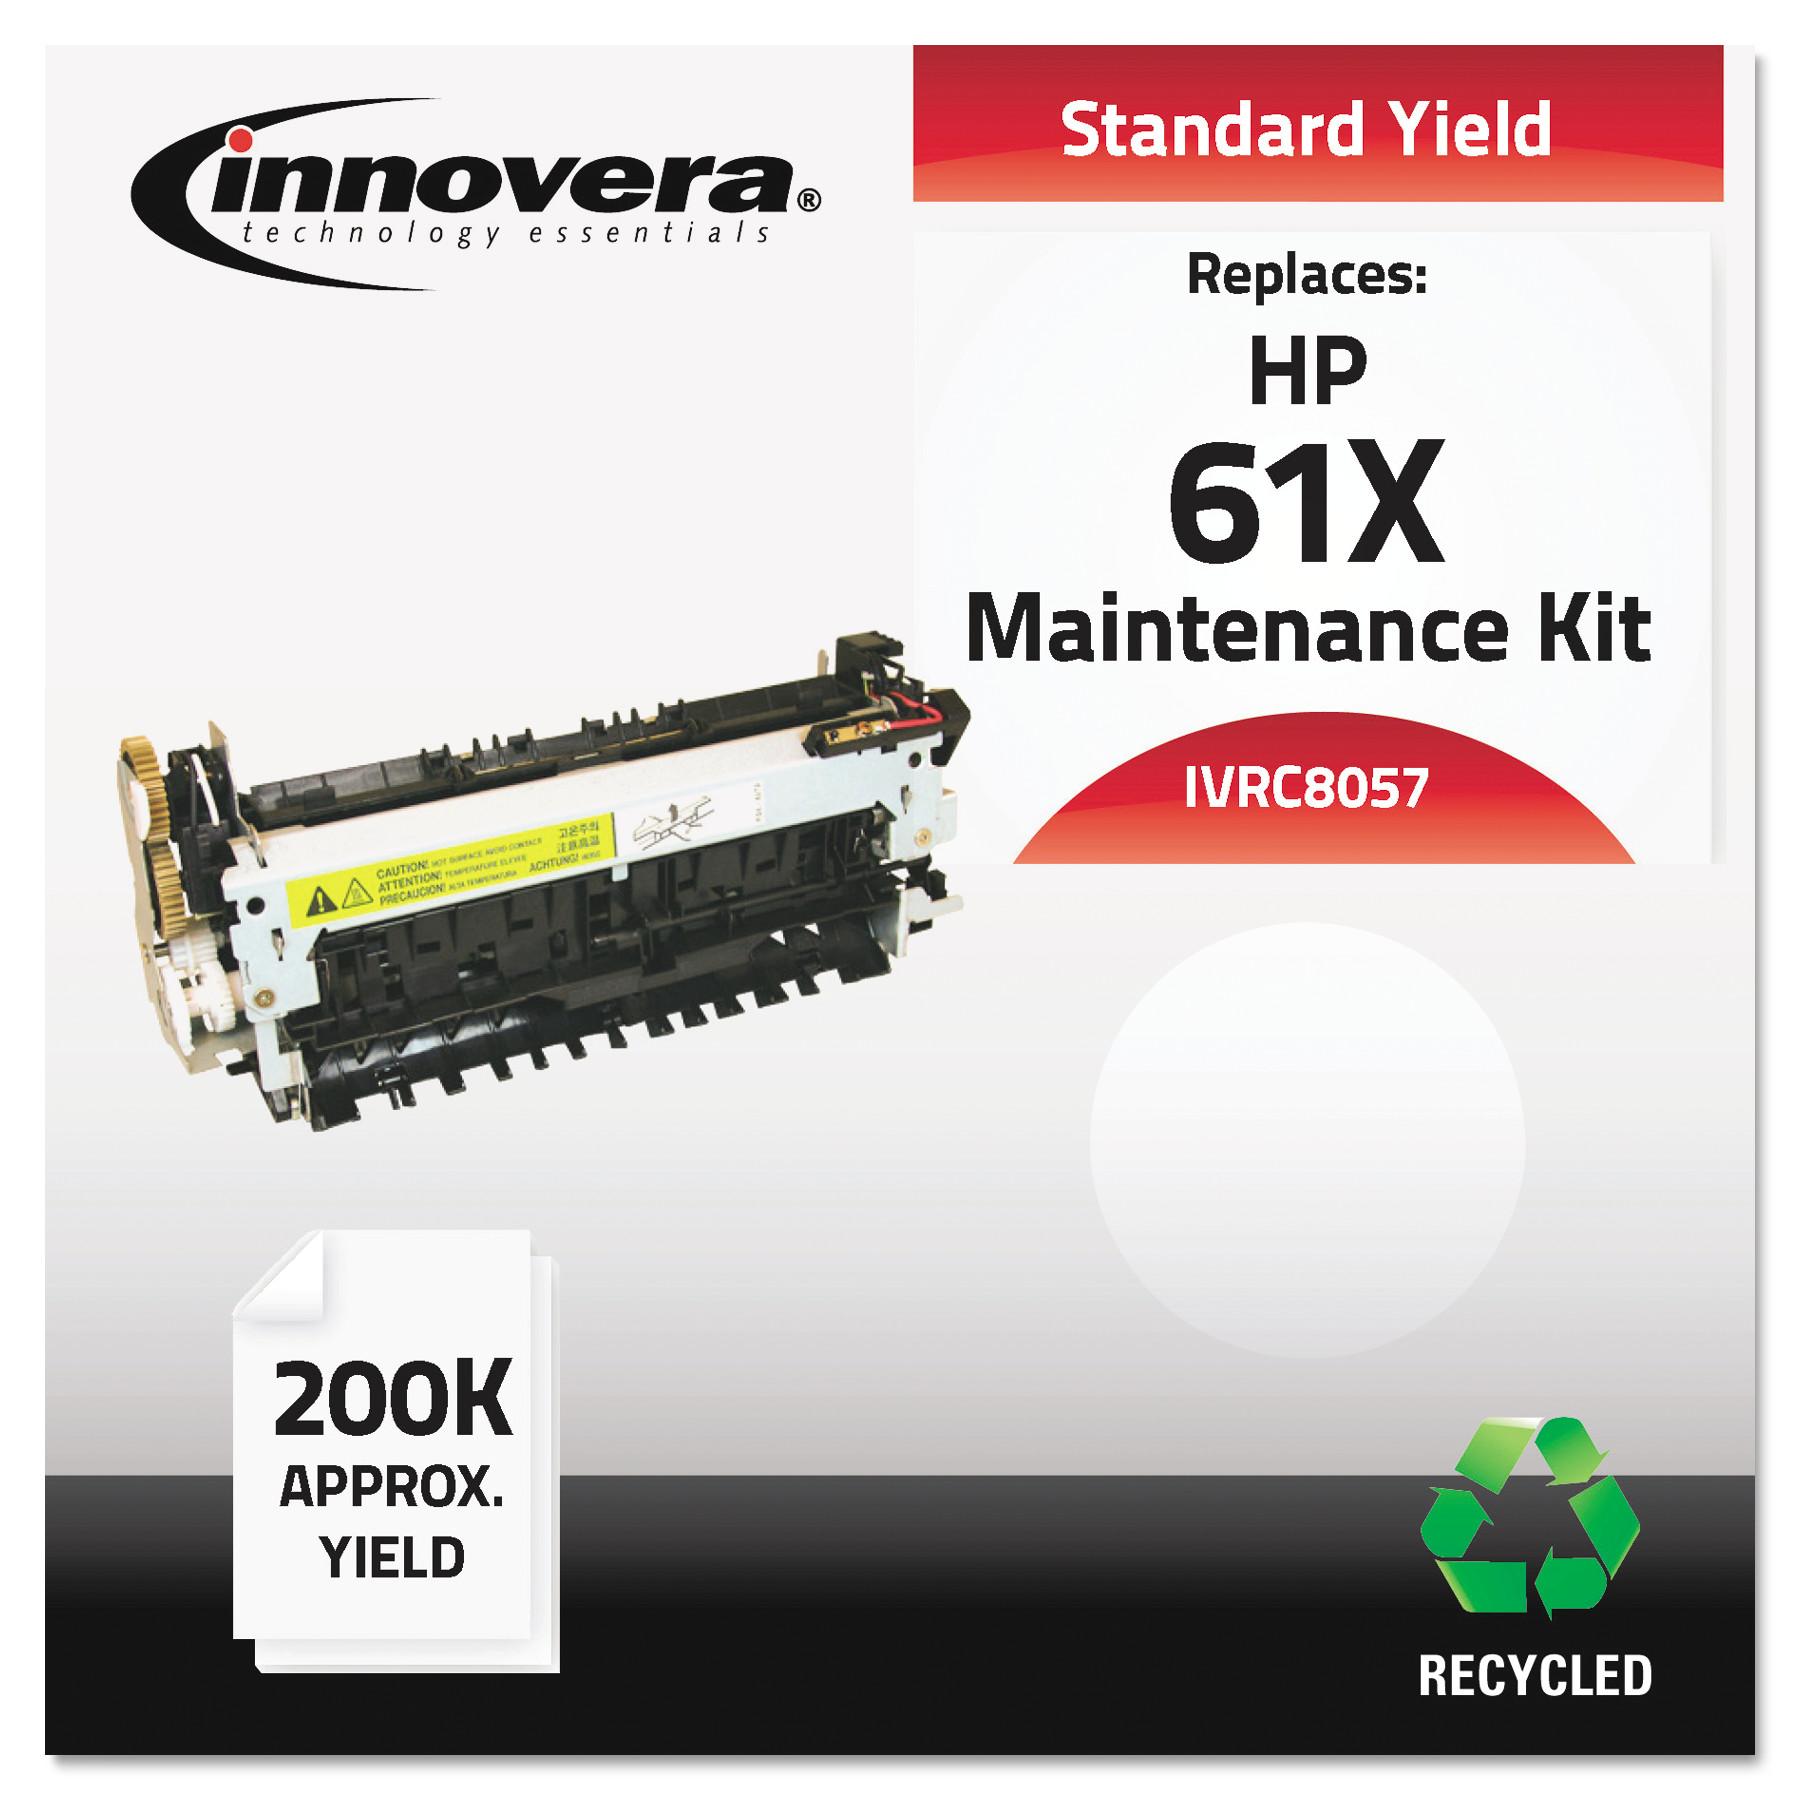 Innovera Remanufactured C8057-67901 (4100) Maintenance Kit